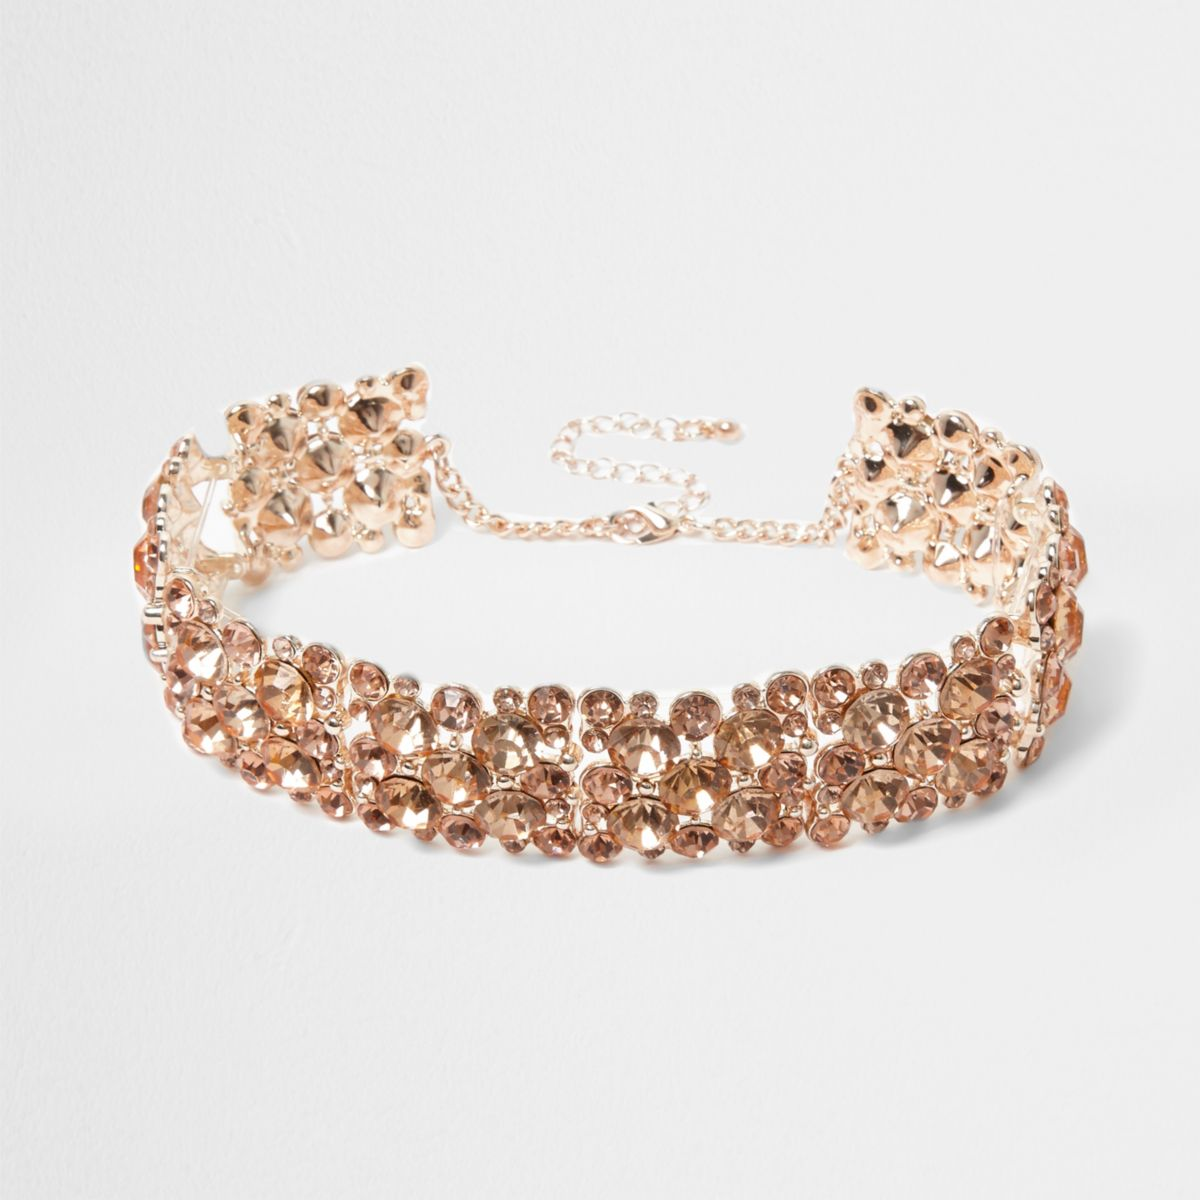 Rose gold tone rhinestone chain choker